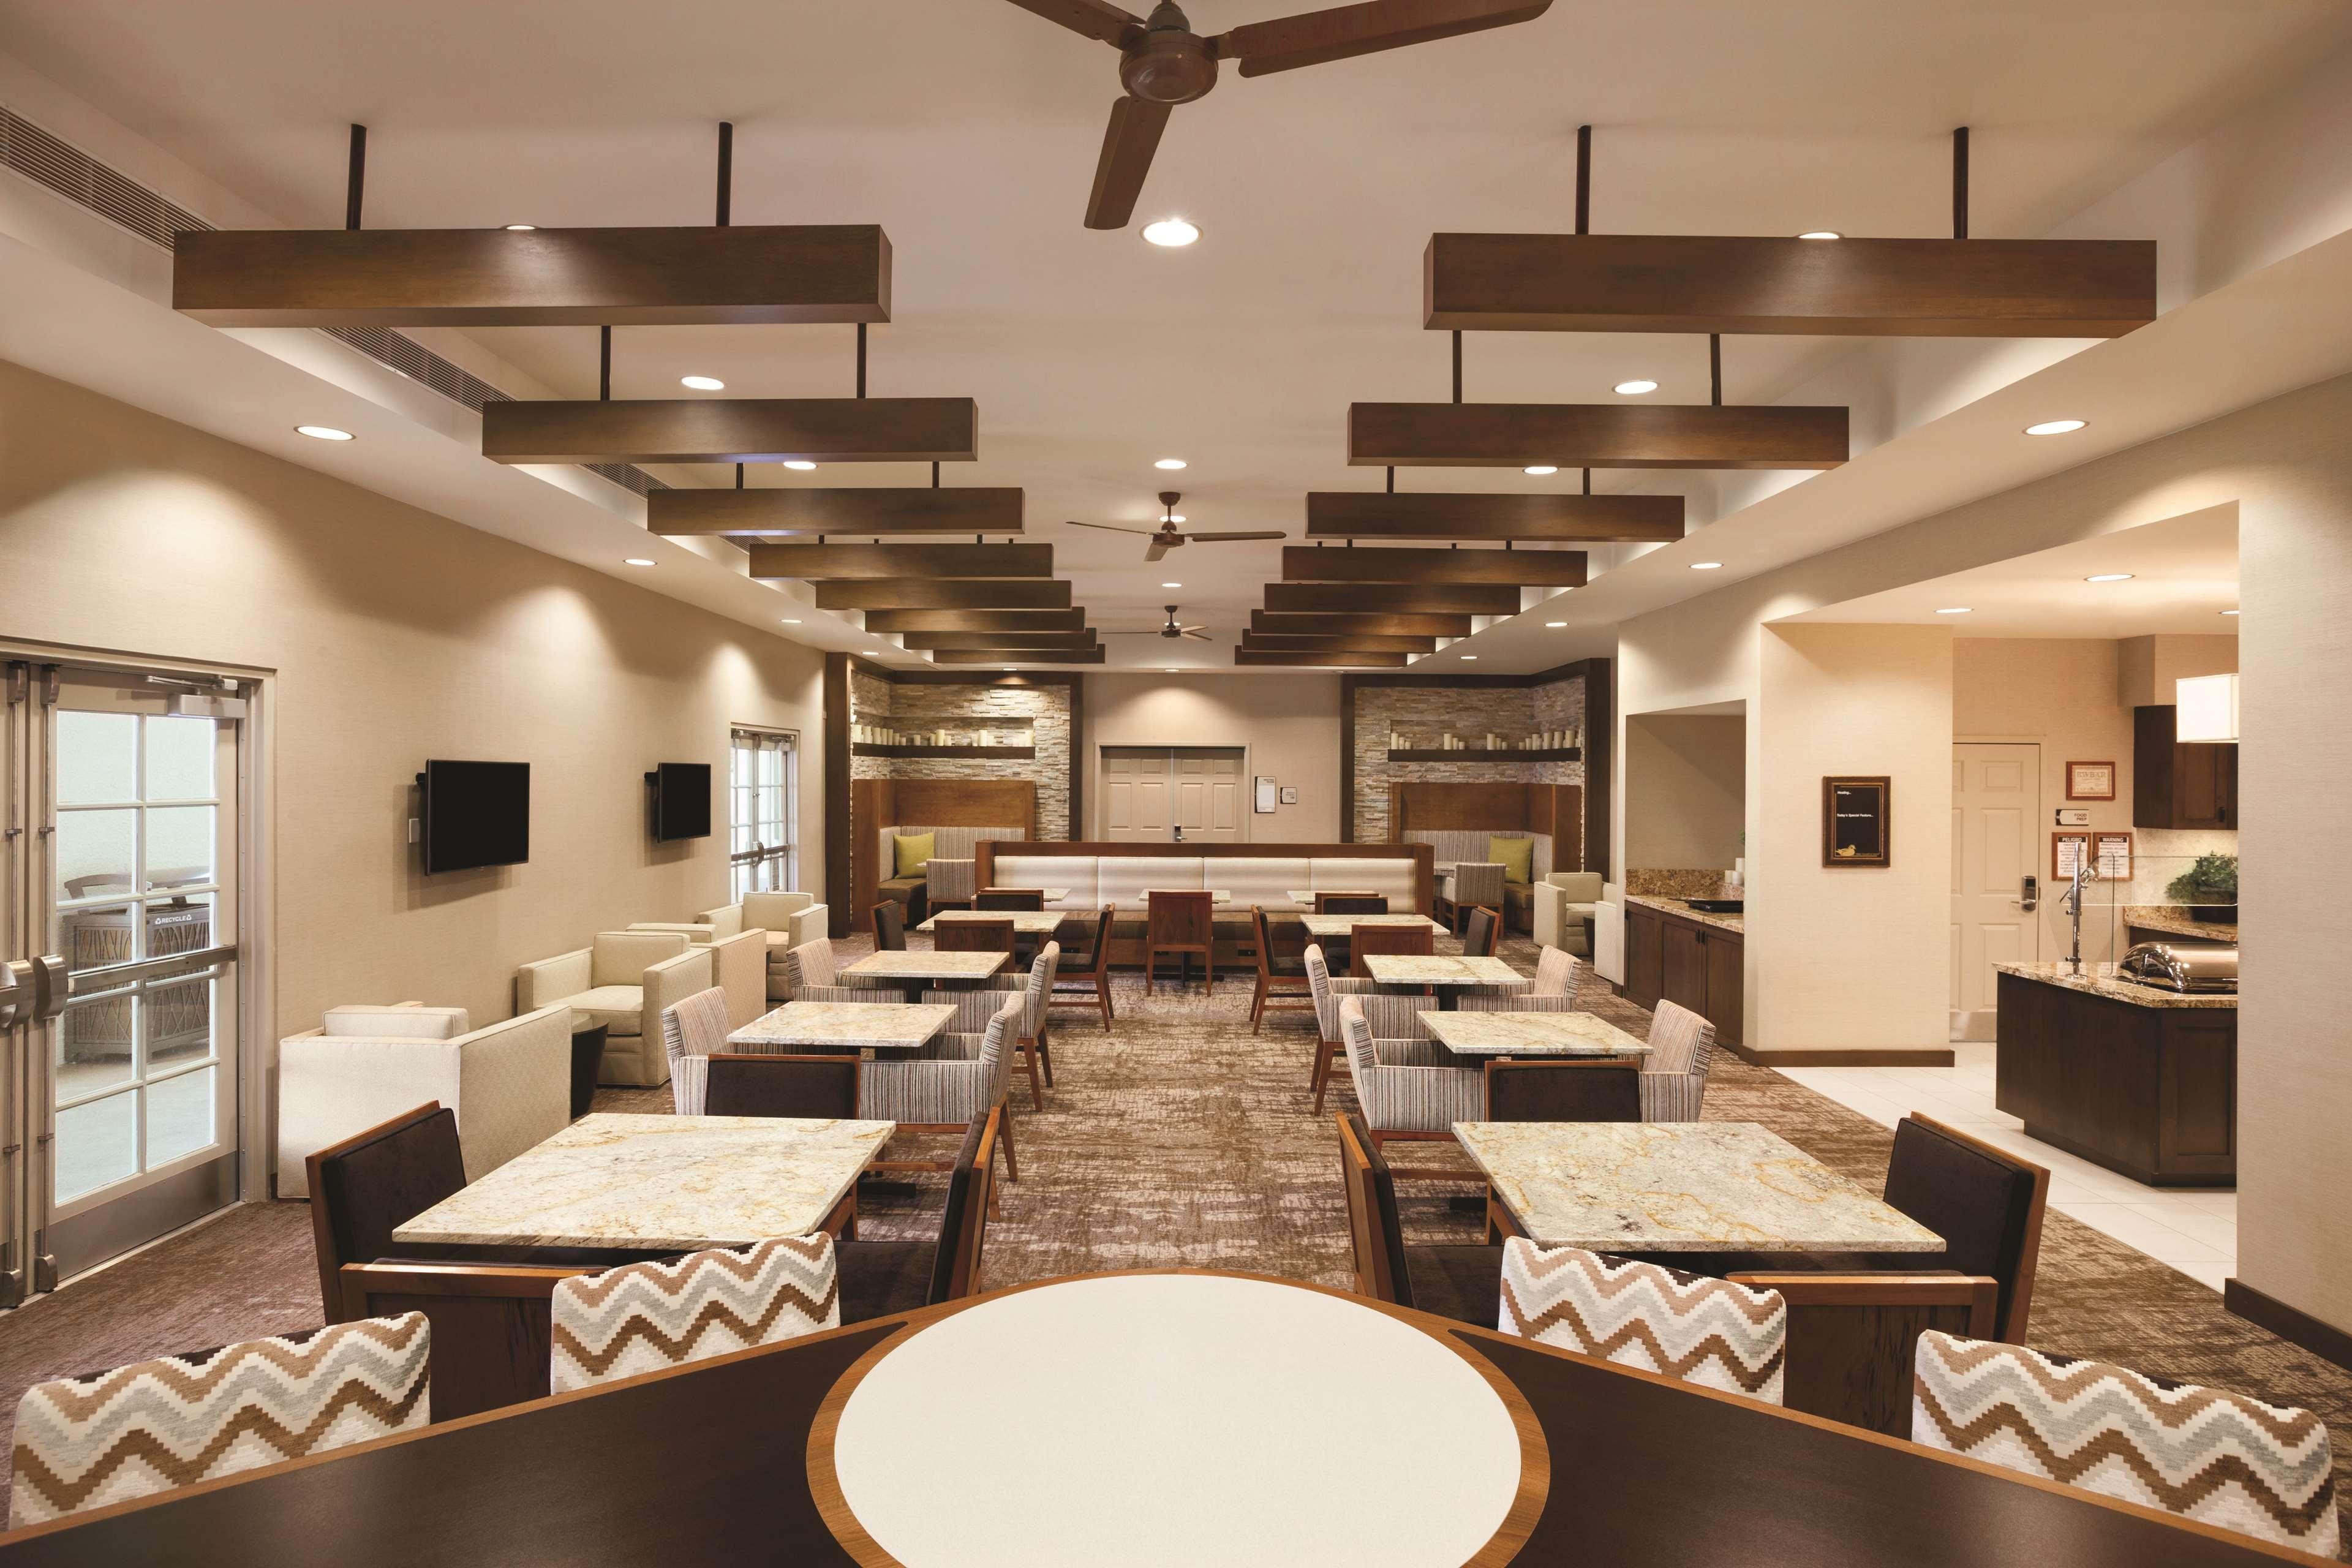 Homewood Suites by Hilton Tucson/St. Philip's Plaza University